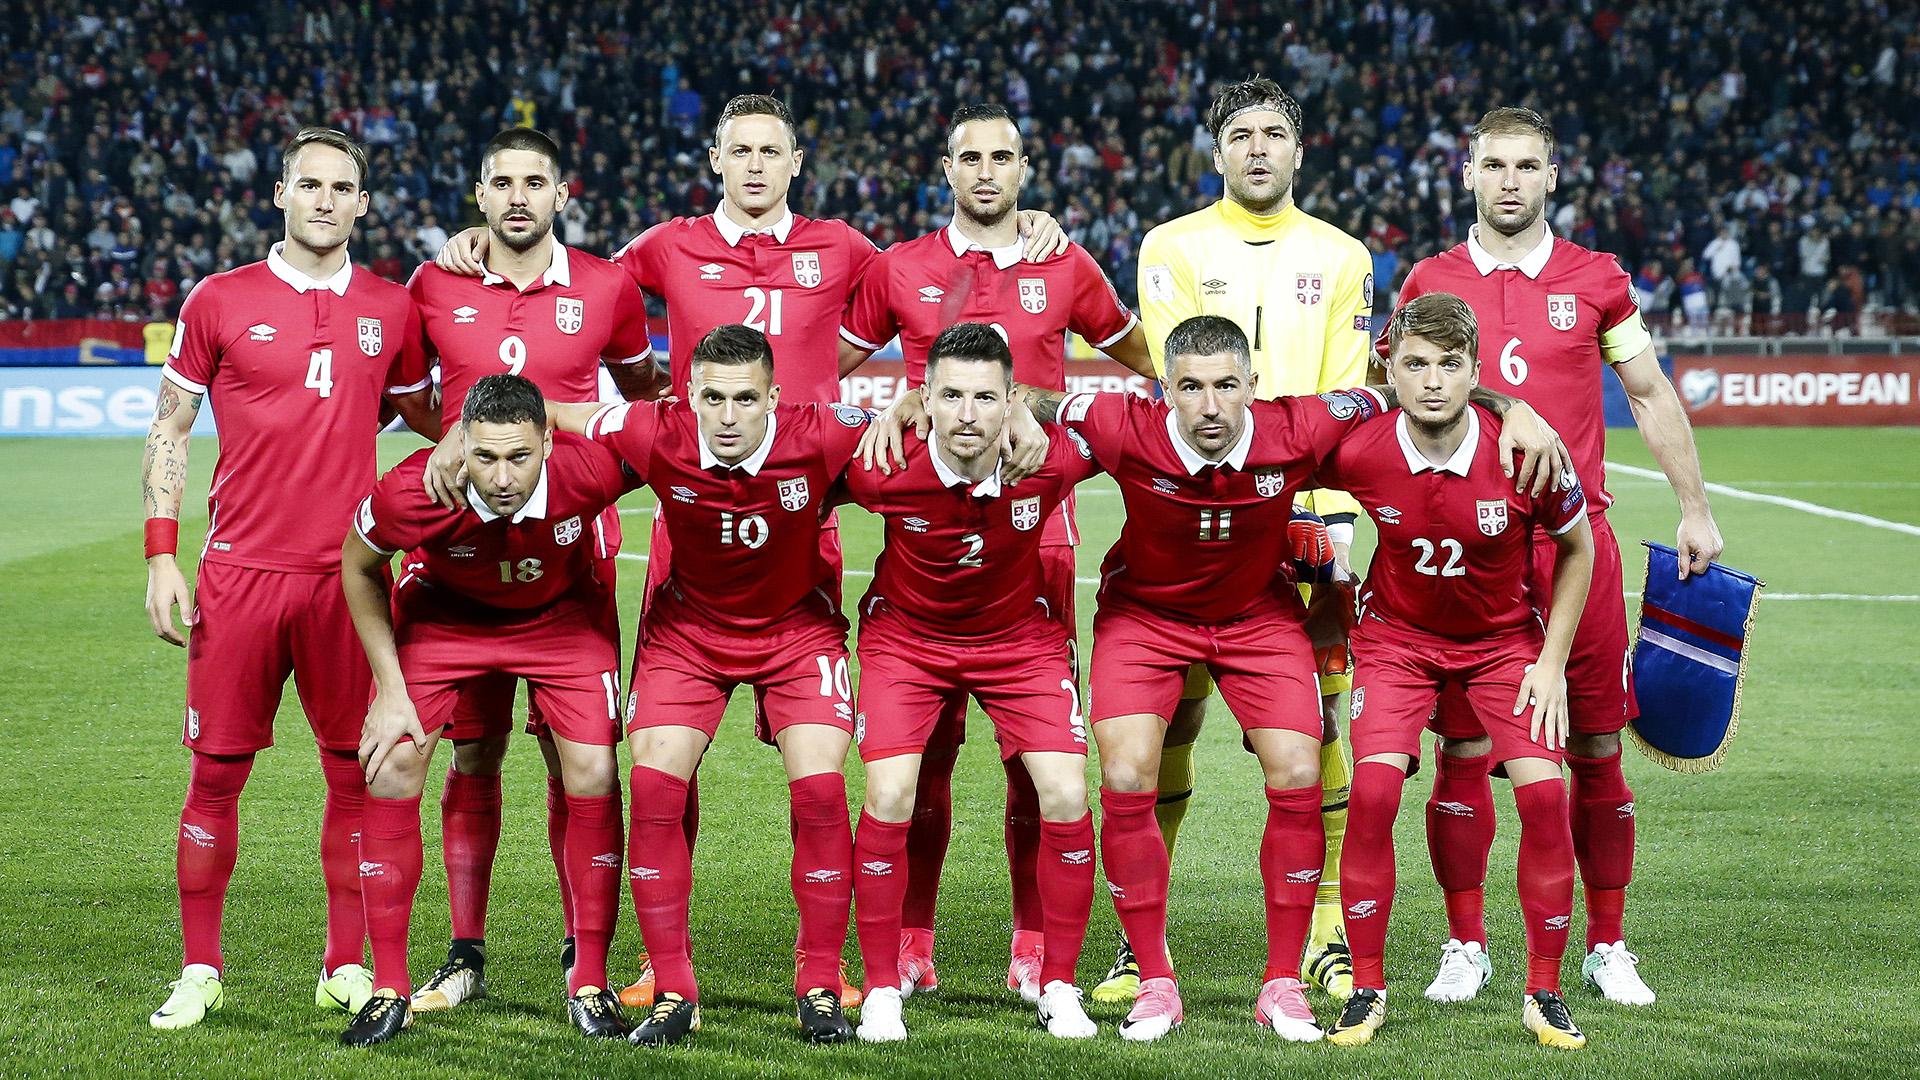 Serbia national team 2017